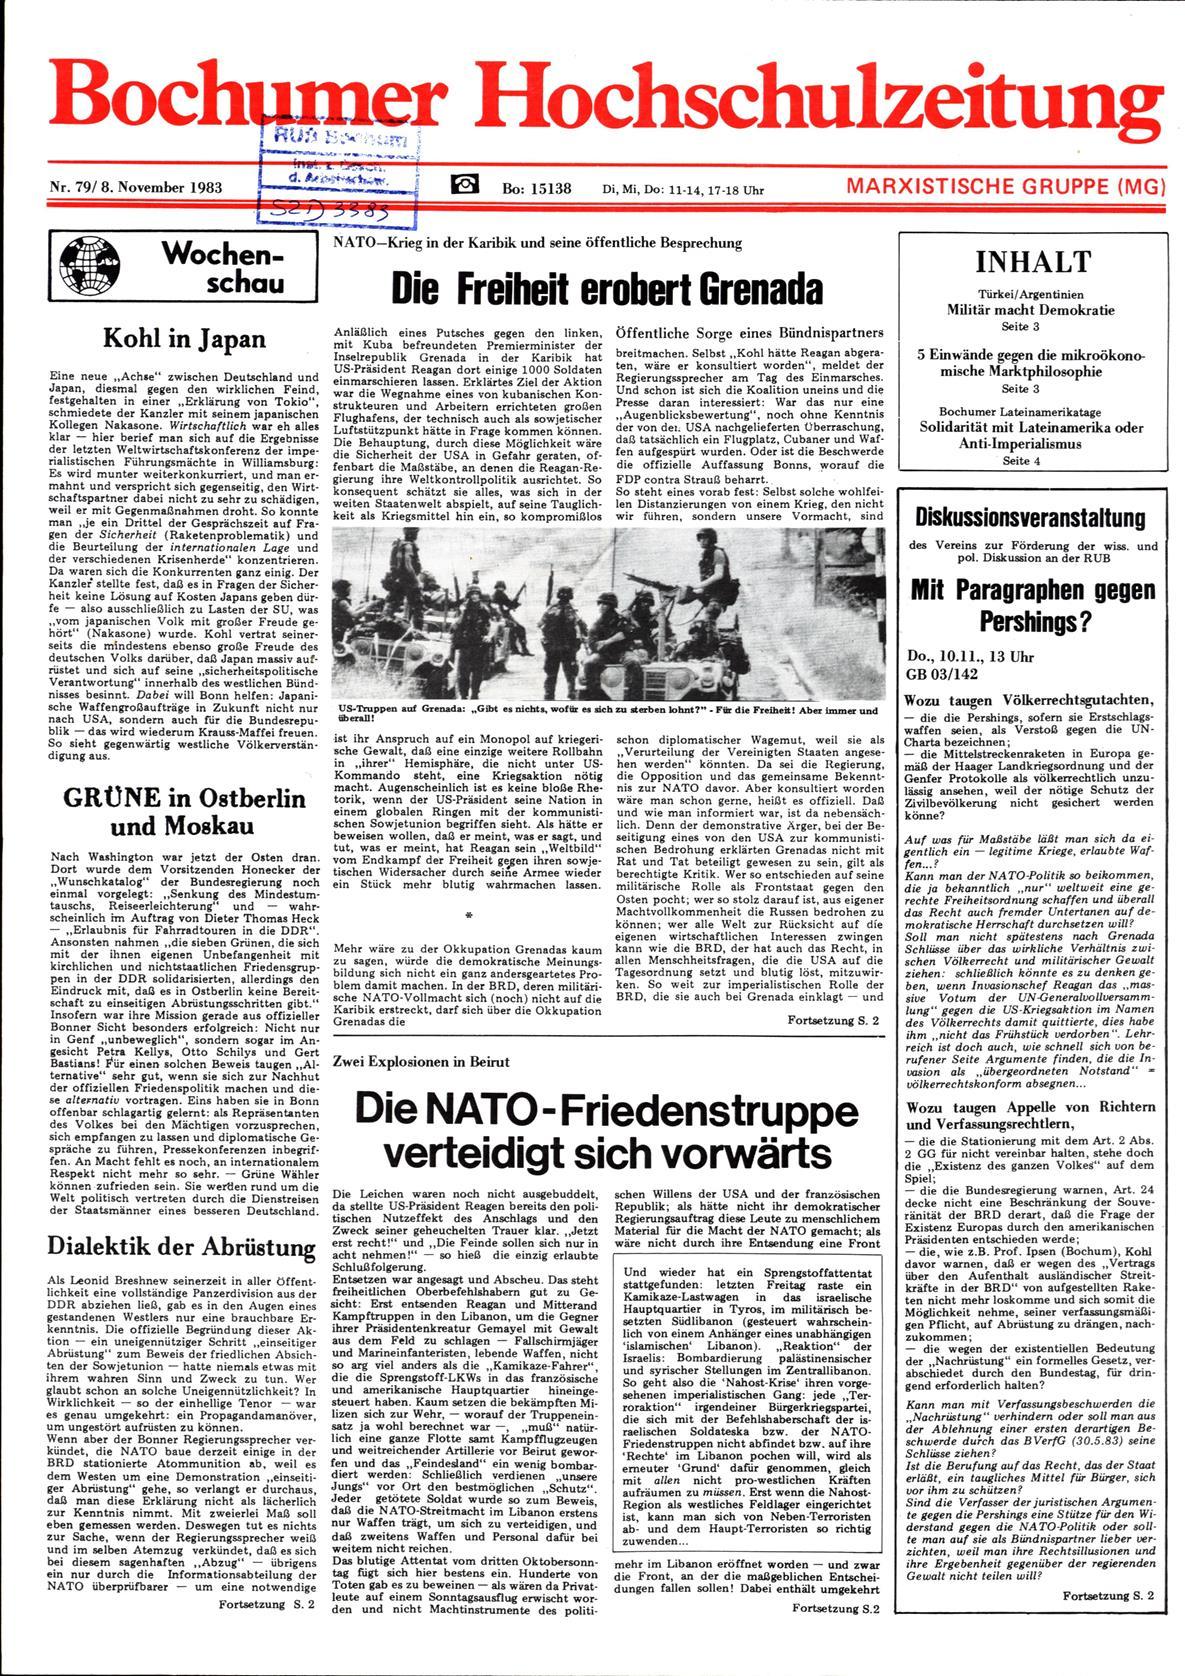 Bochum_BHZ_19831108_079_001